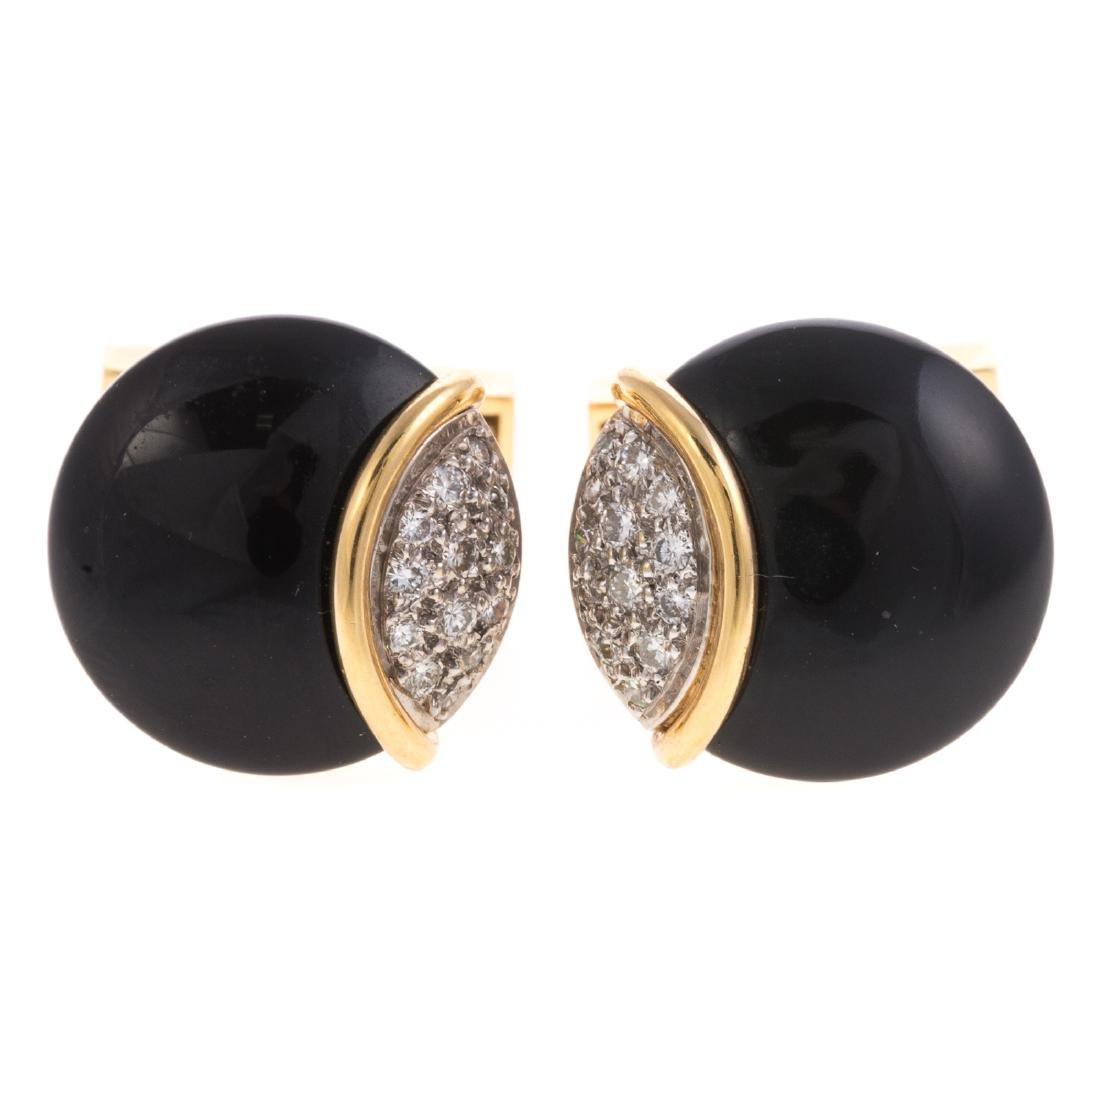 A Pair of Gent's Black Onyx & Diamond Cufflinks